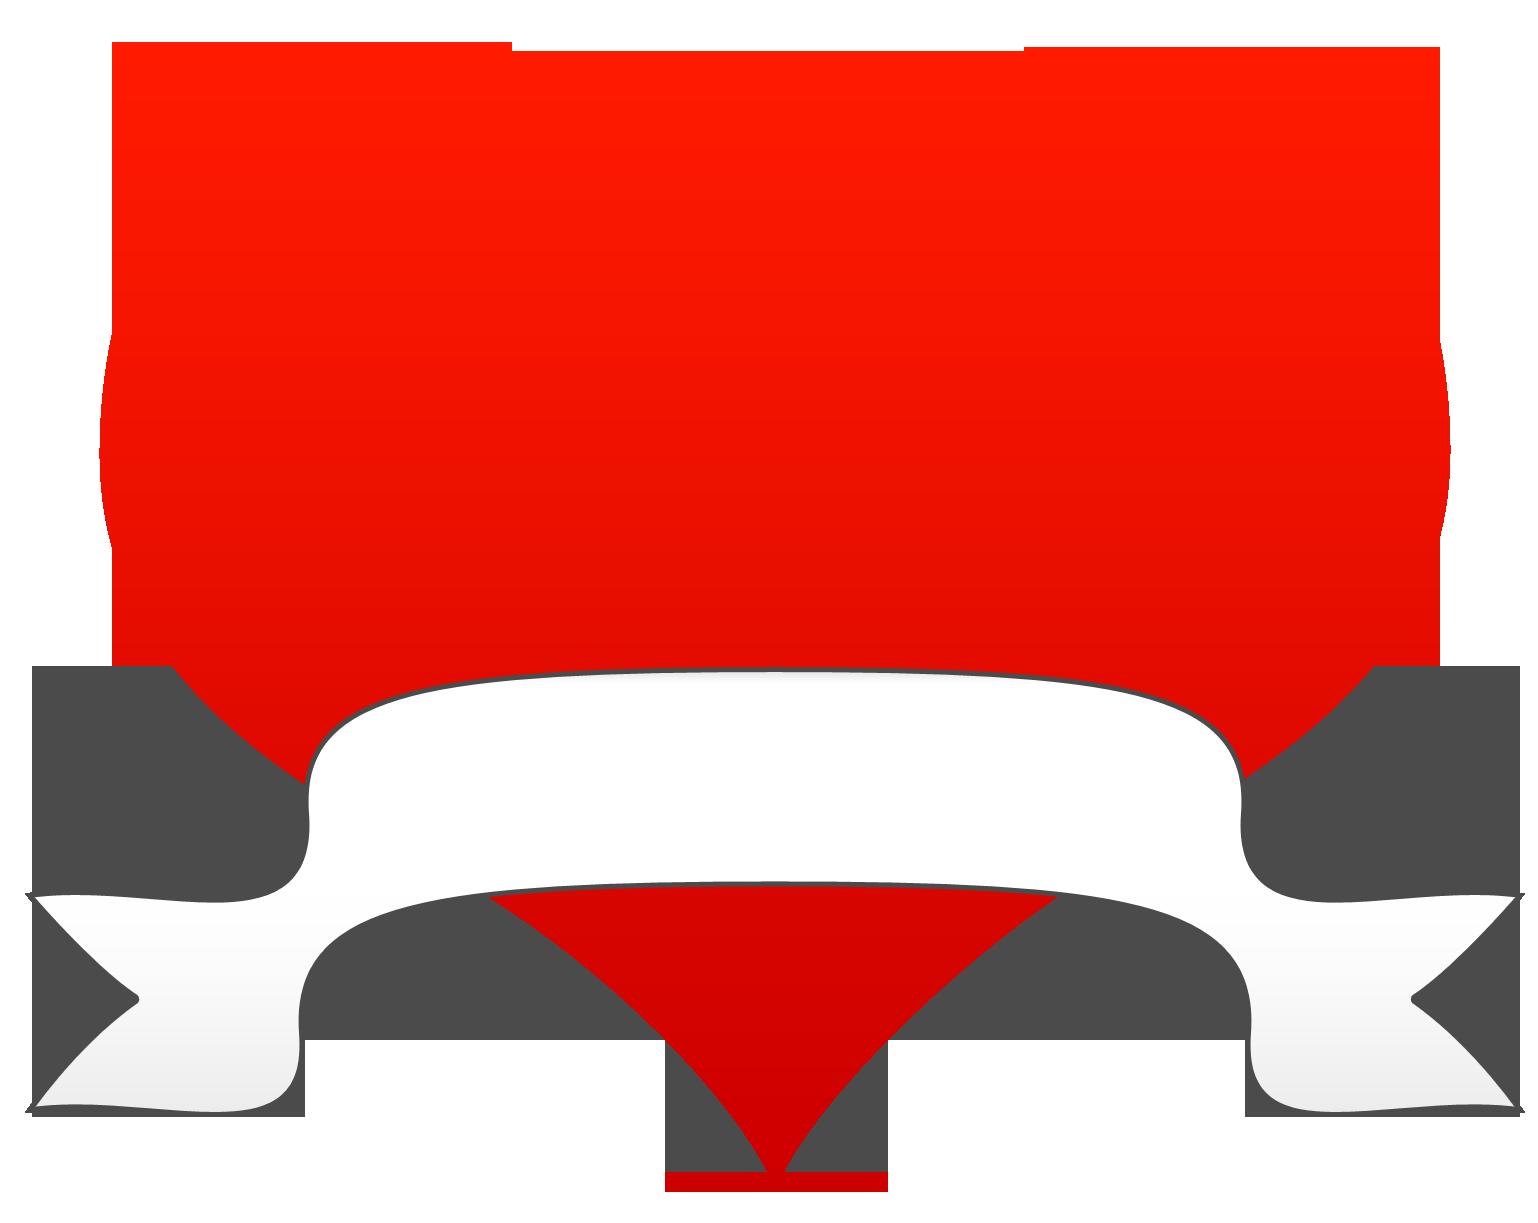 1538x1223 Heart Clipart, Heart Clip Art Romantic For Love, Graphics